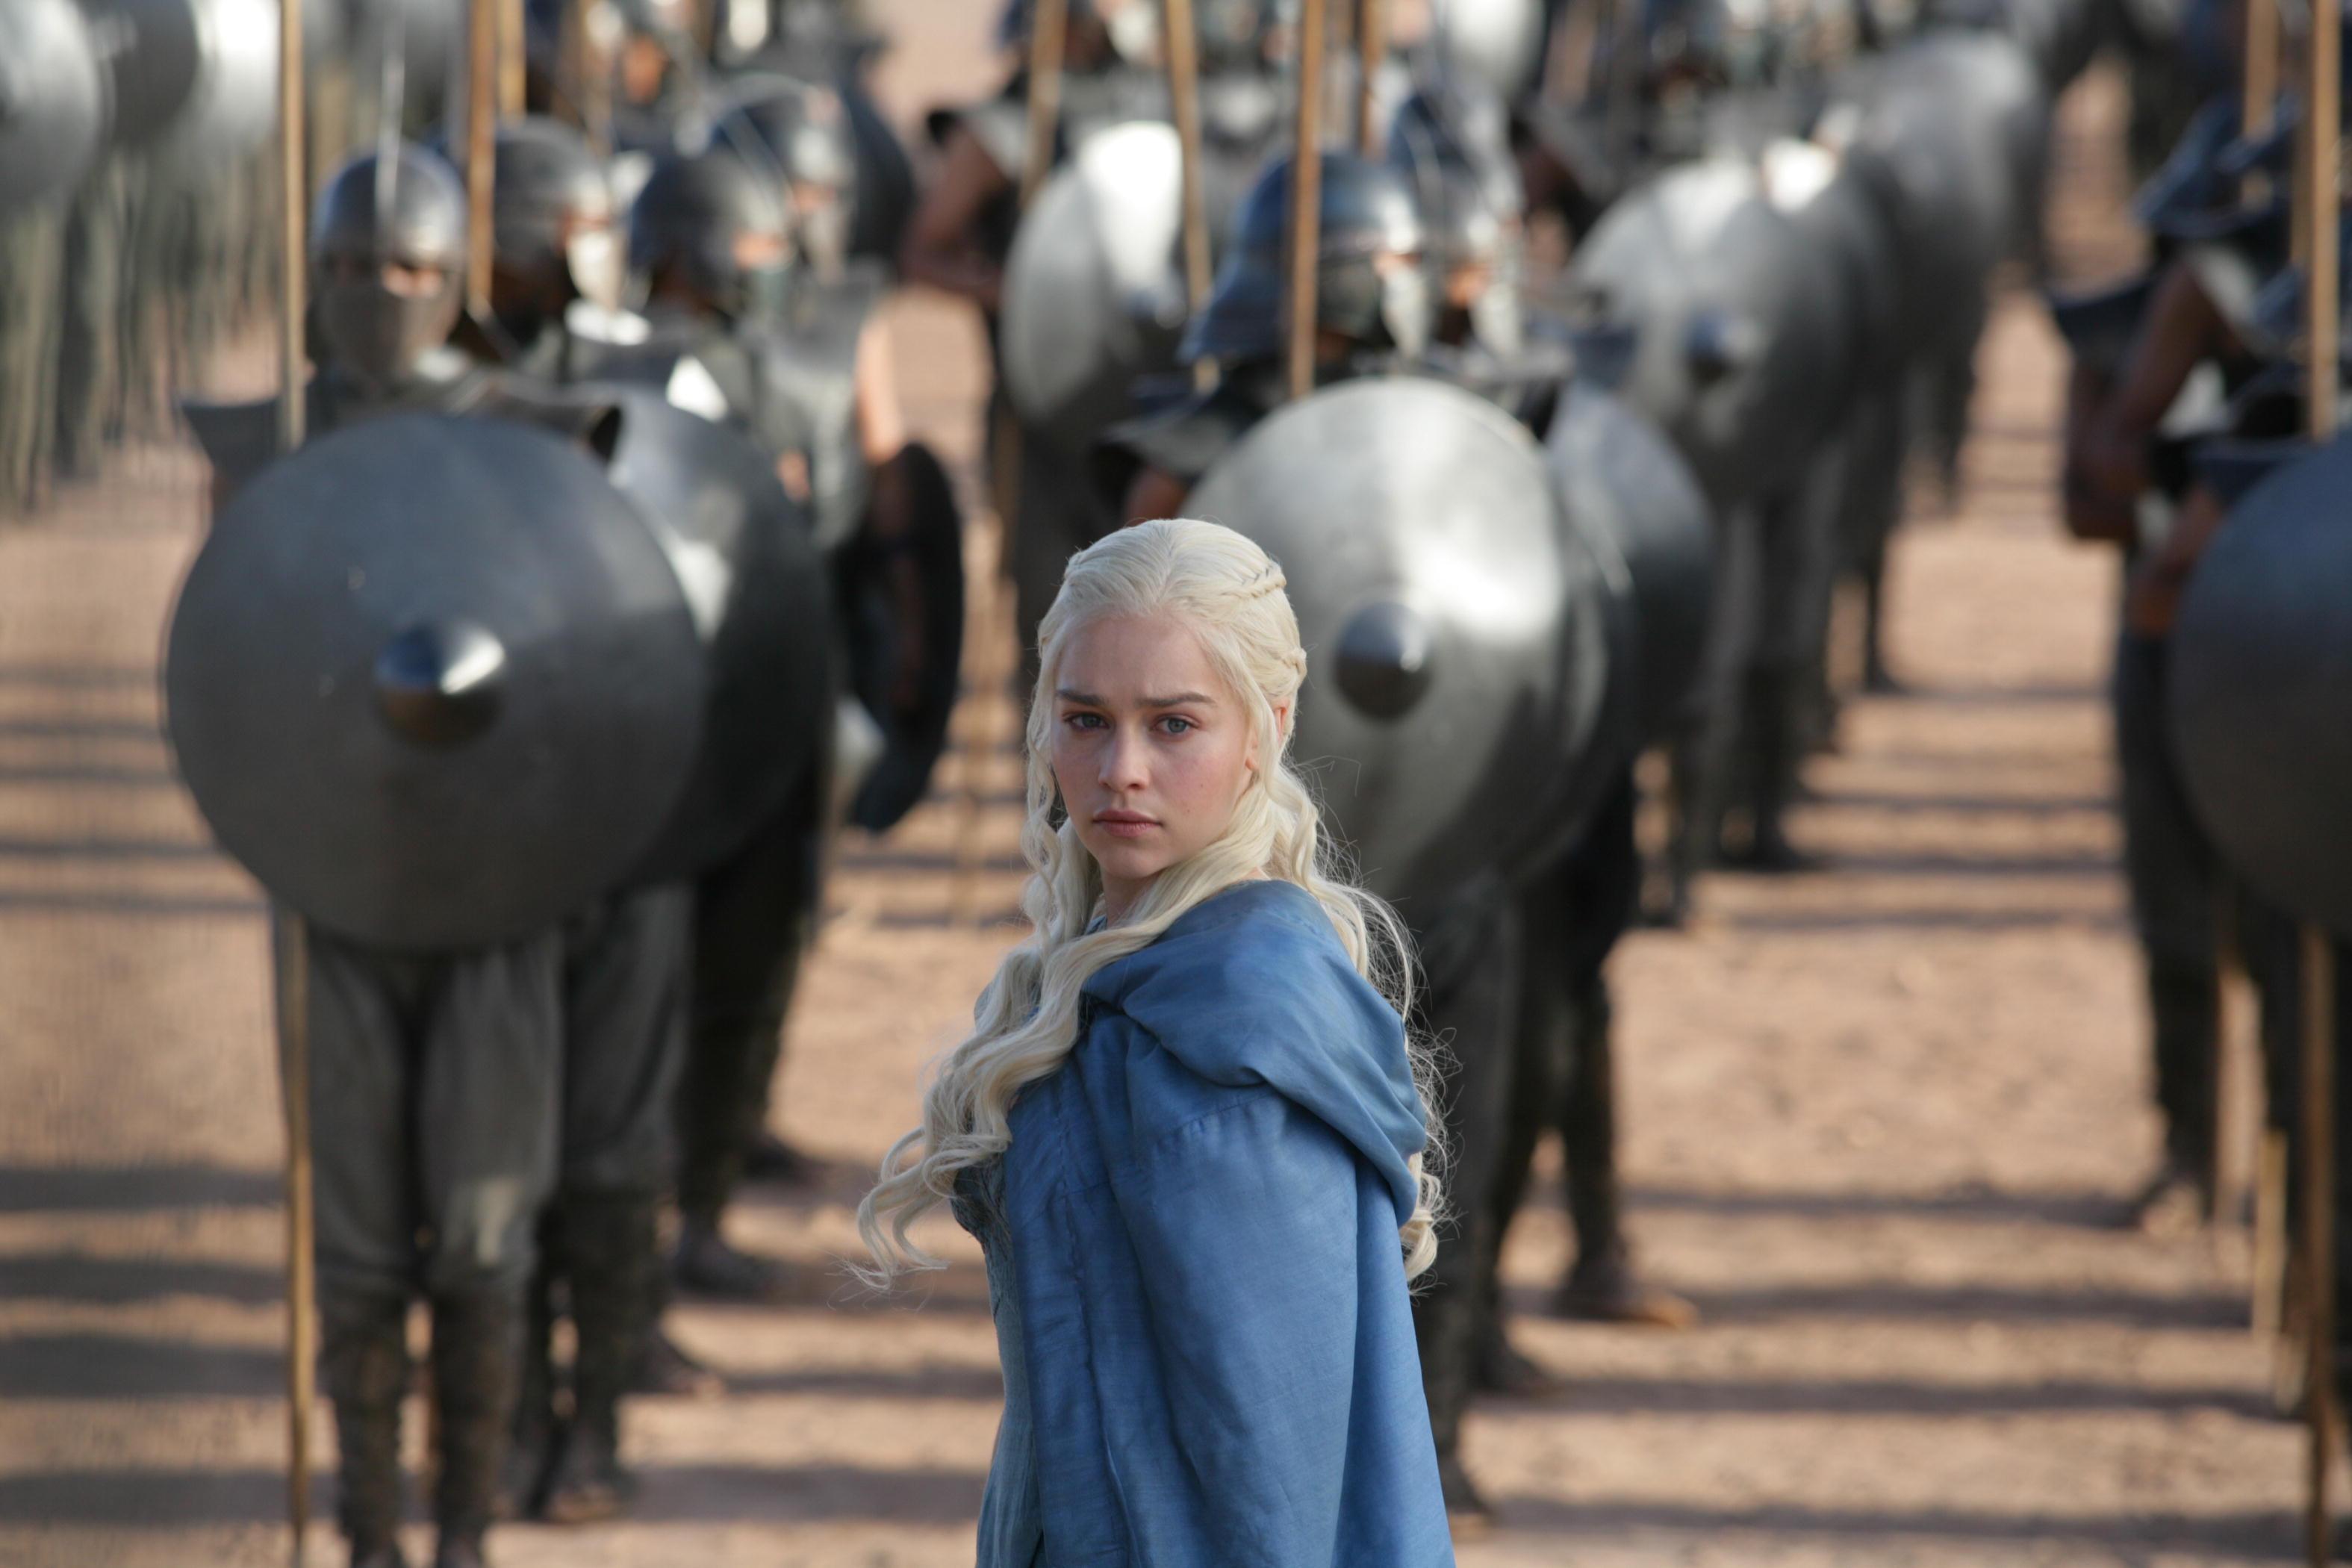 http://www.thecantinacrew.com/wp-content/uploads/2013/05/Daenerys-Targaryen-S3-daenerys-targaryen-33428349-3150-2100.jpg